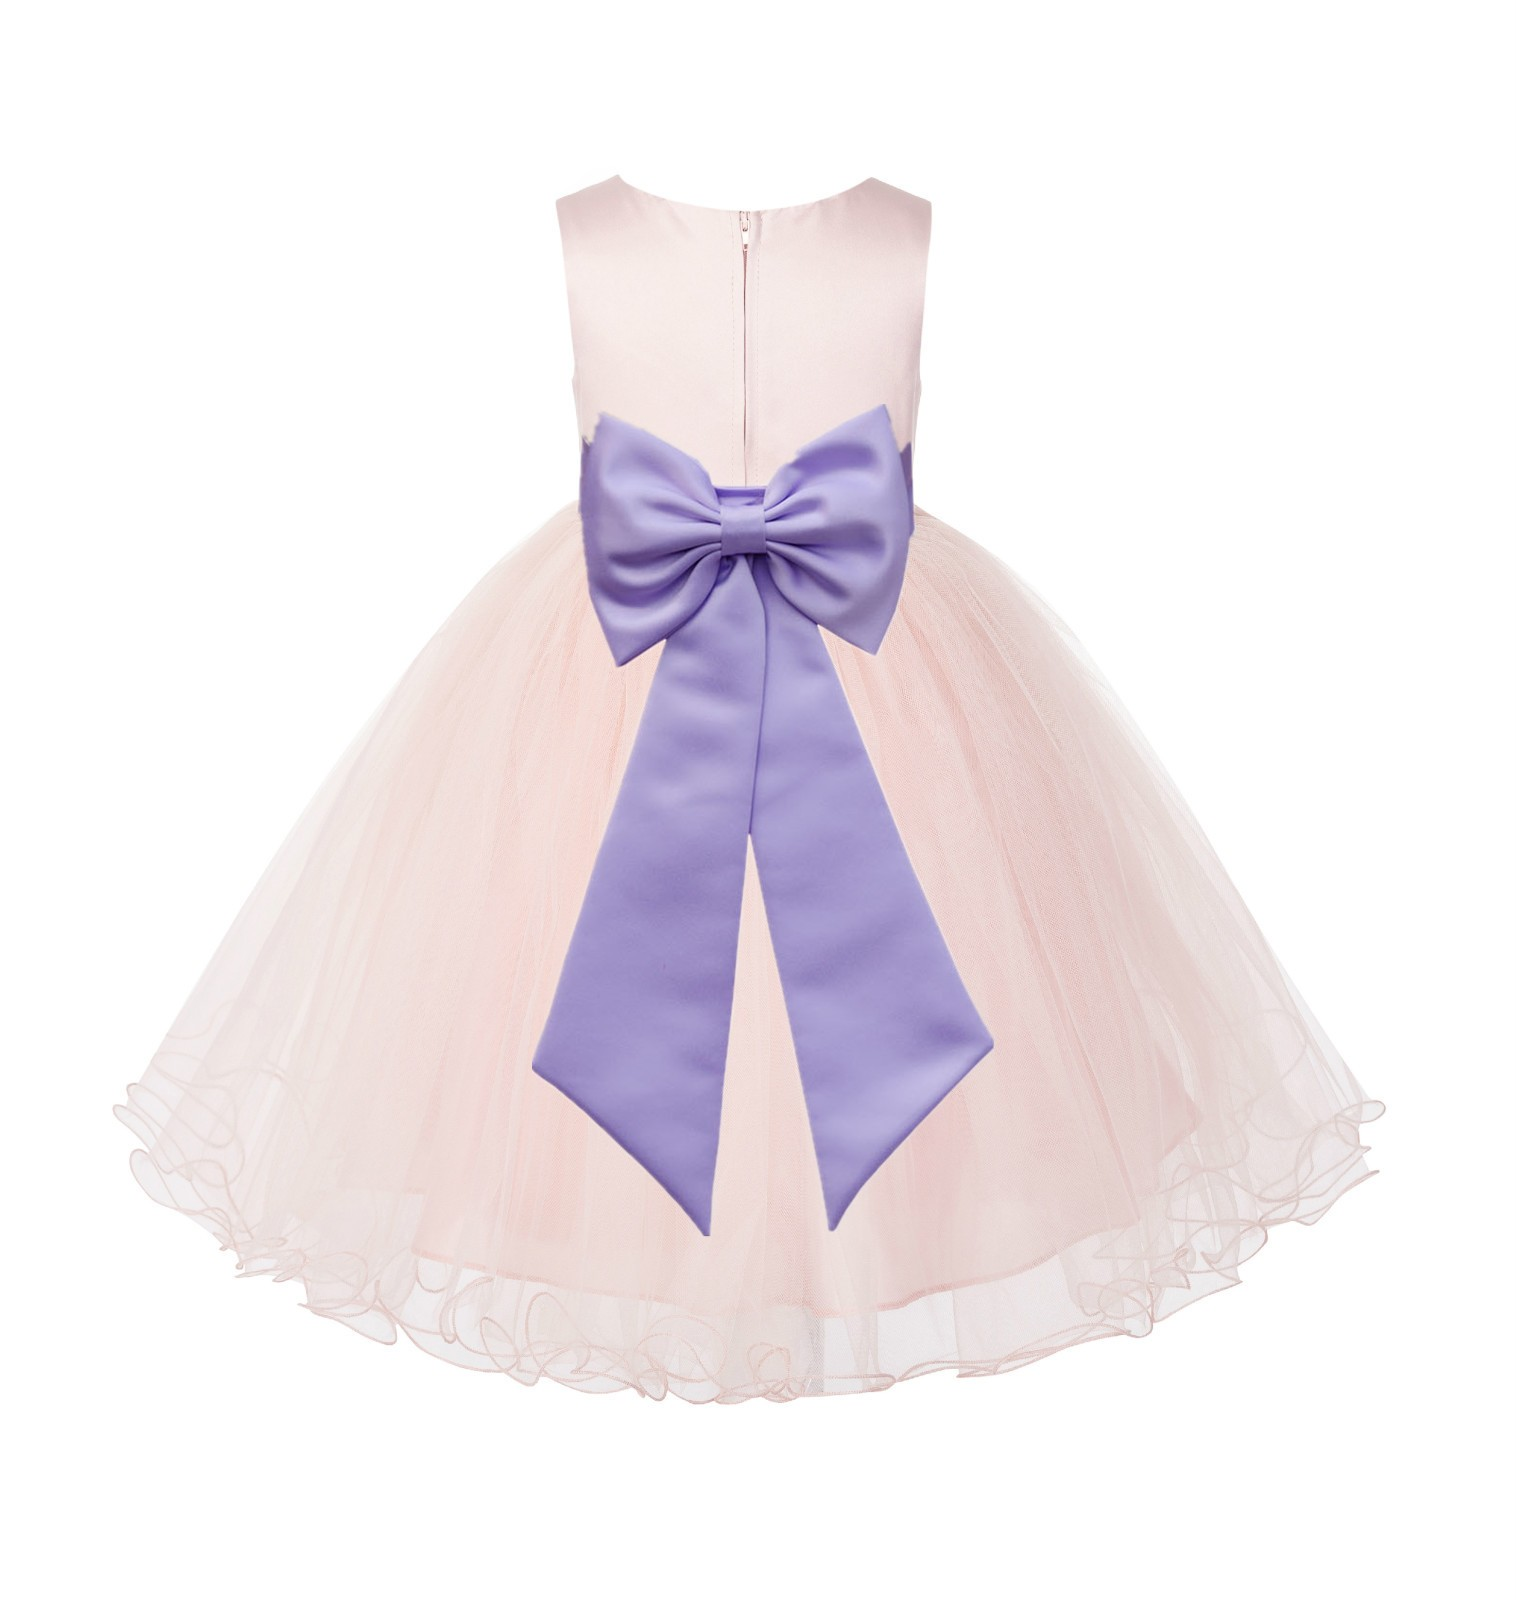 Blush PInk / Lilac Tulle Rattail Edge Flower Girl Dress Wedding Bridesmaid 829T